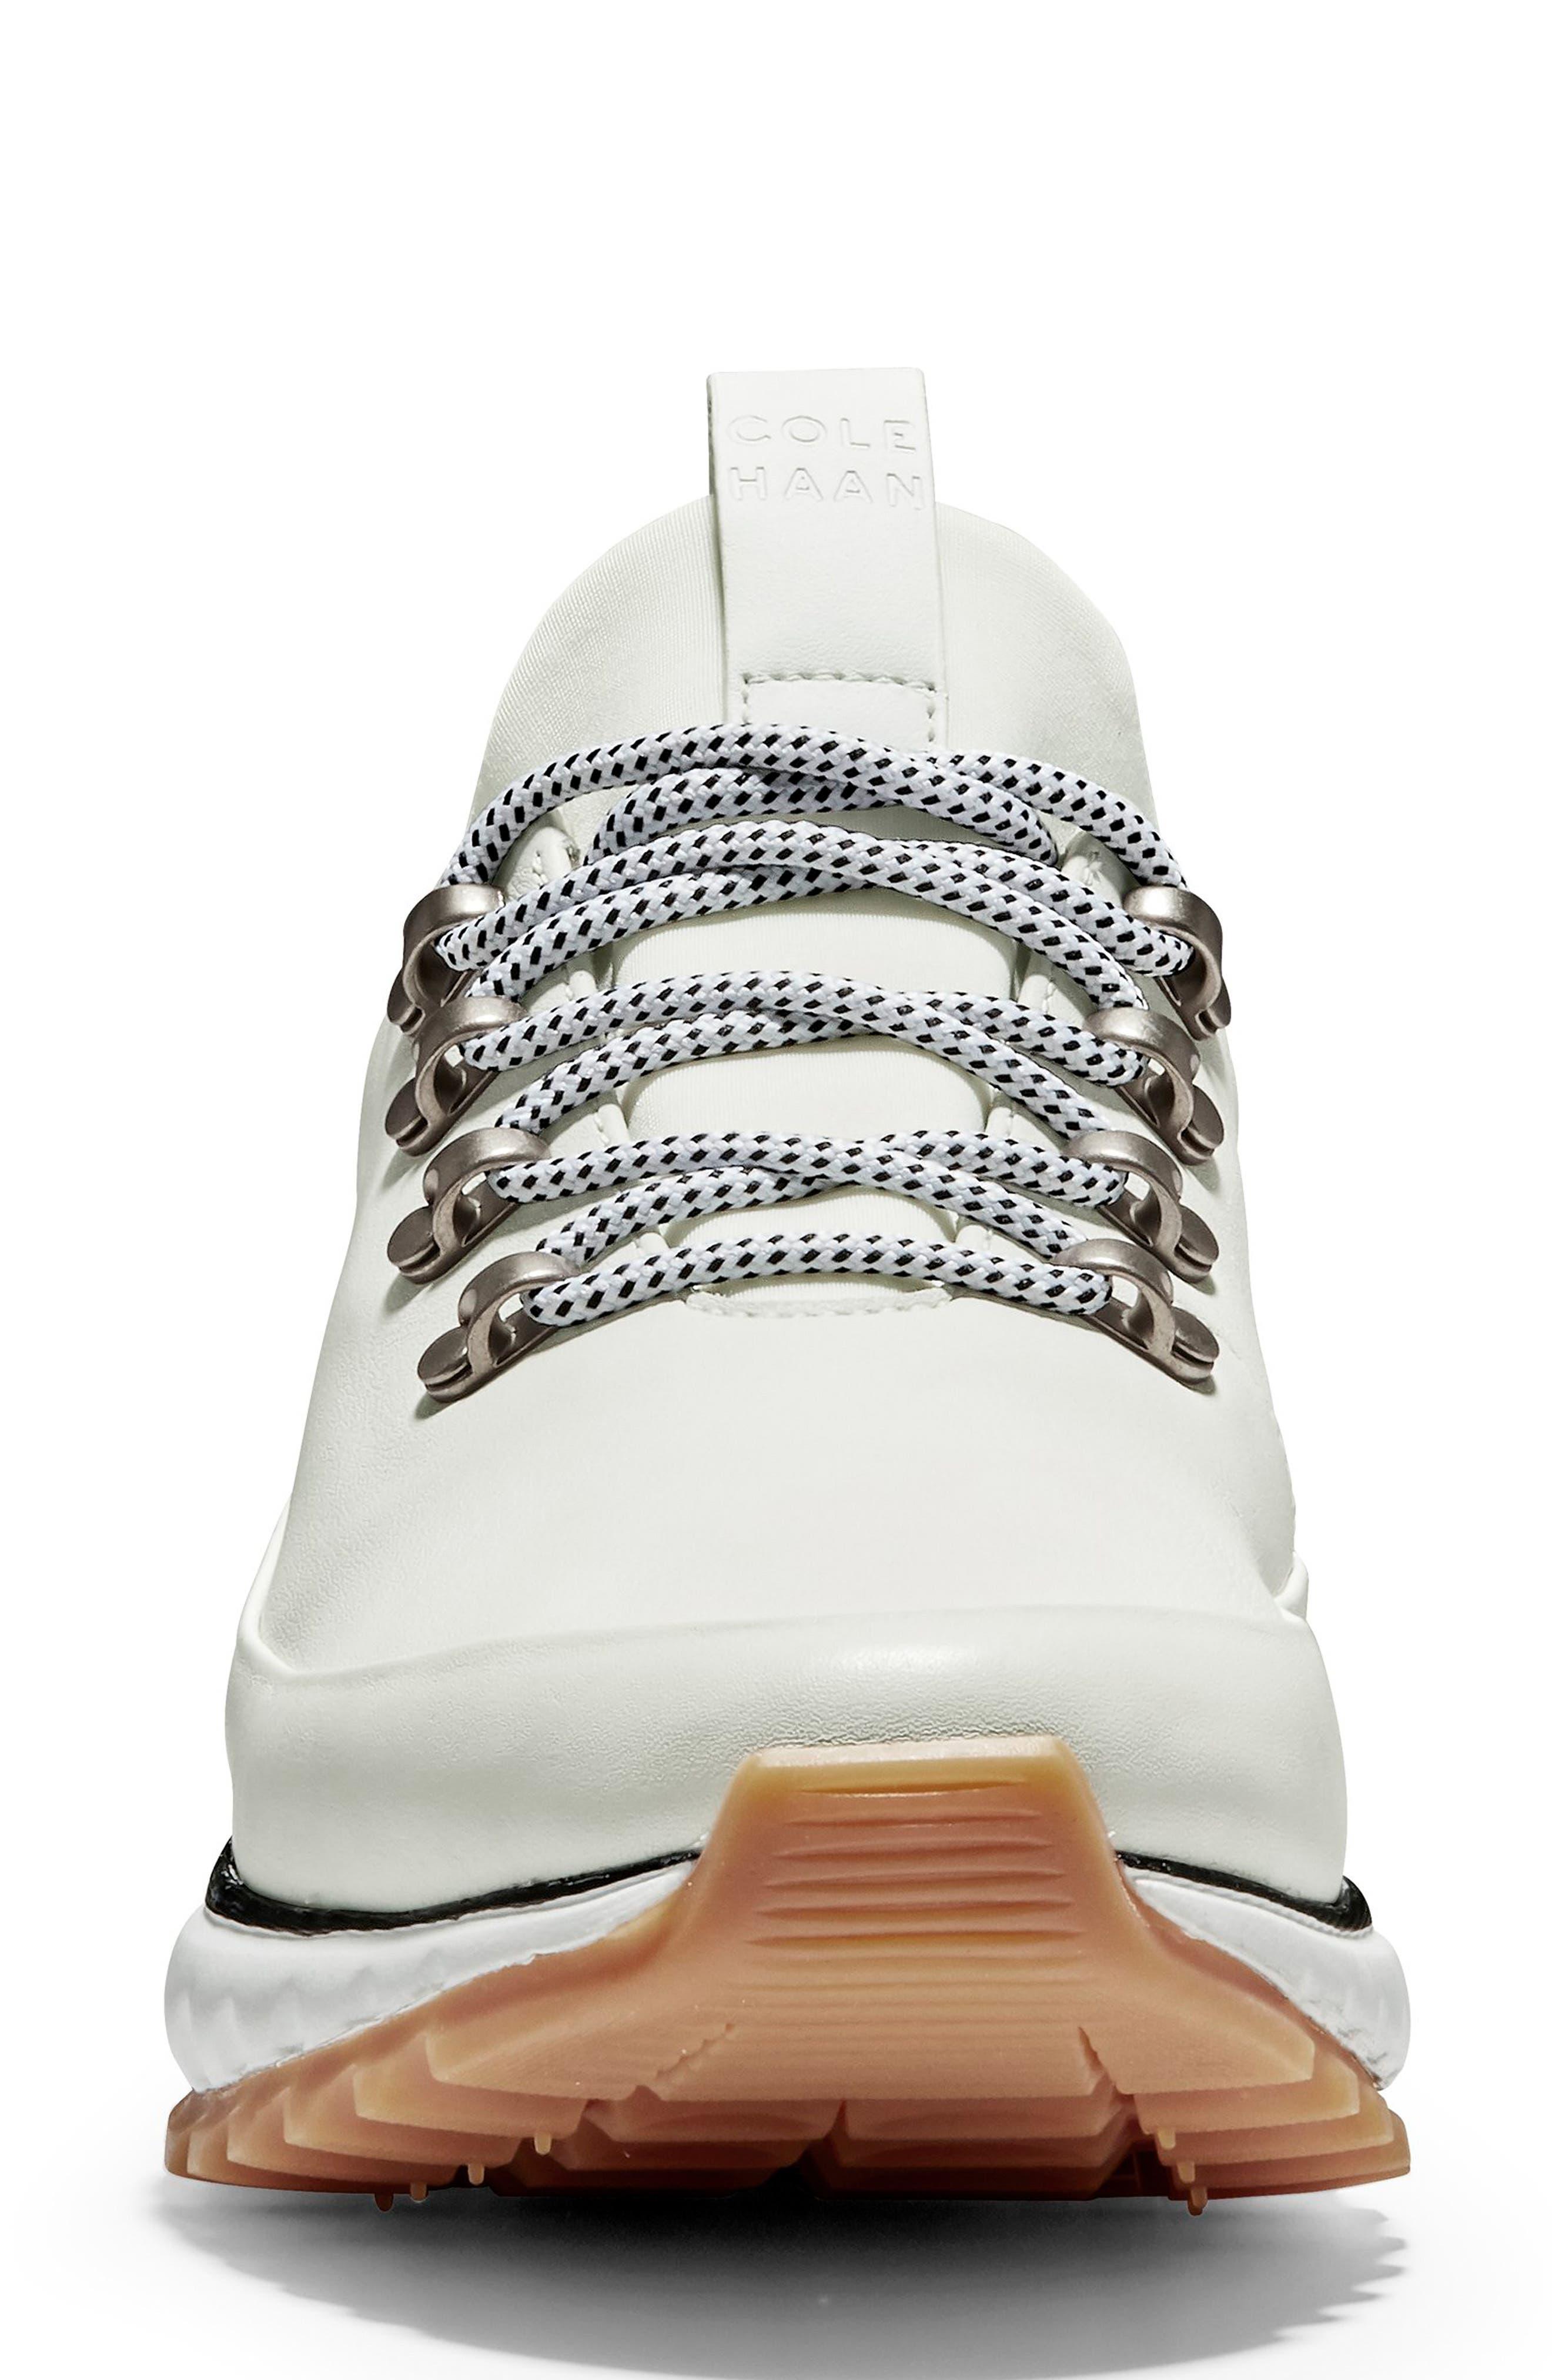 GrandExplore All Terrain Waterproof Sneaker,                             Alternate thumbnail 4, color,                             OPTIC WHITE WATERPROOF LEATHER